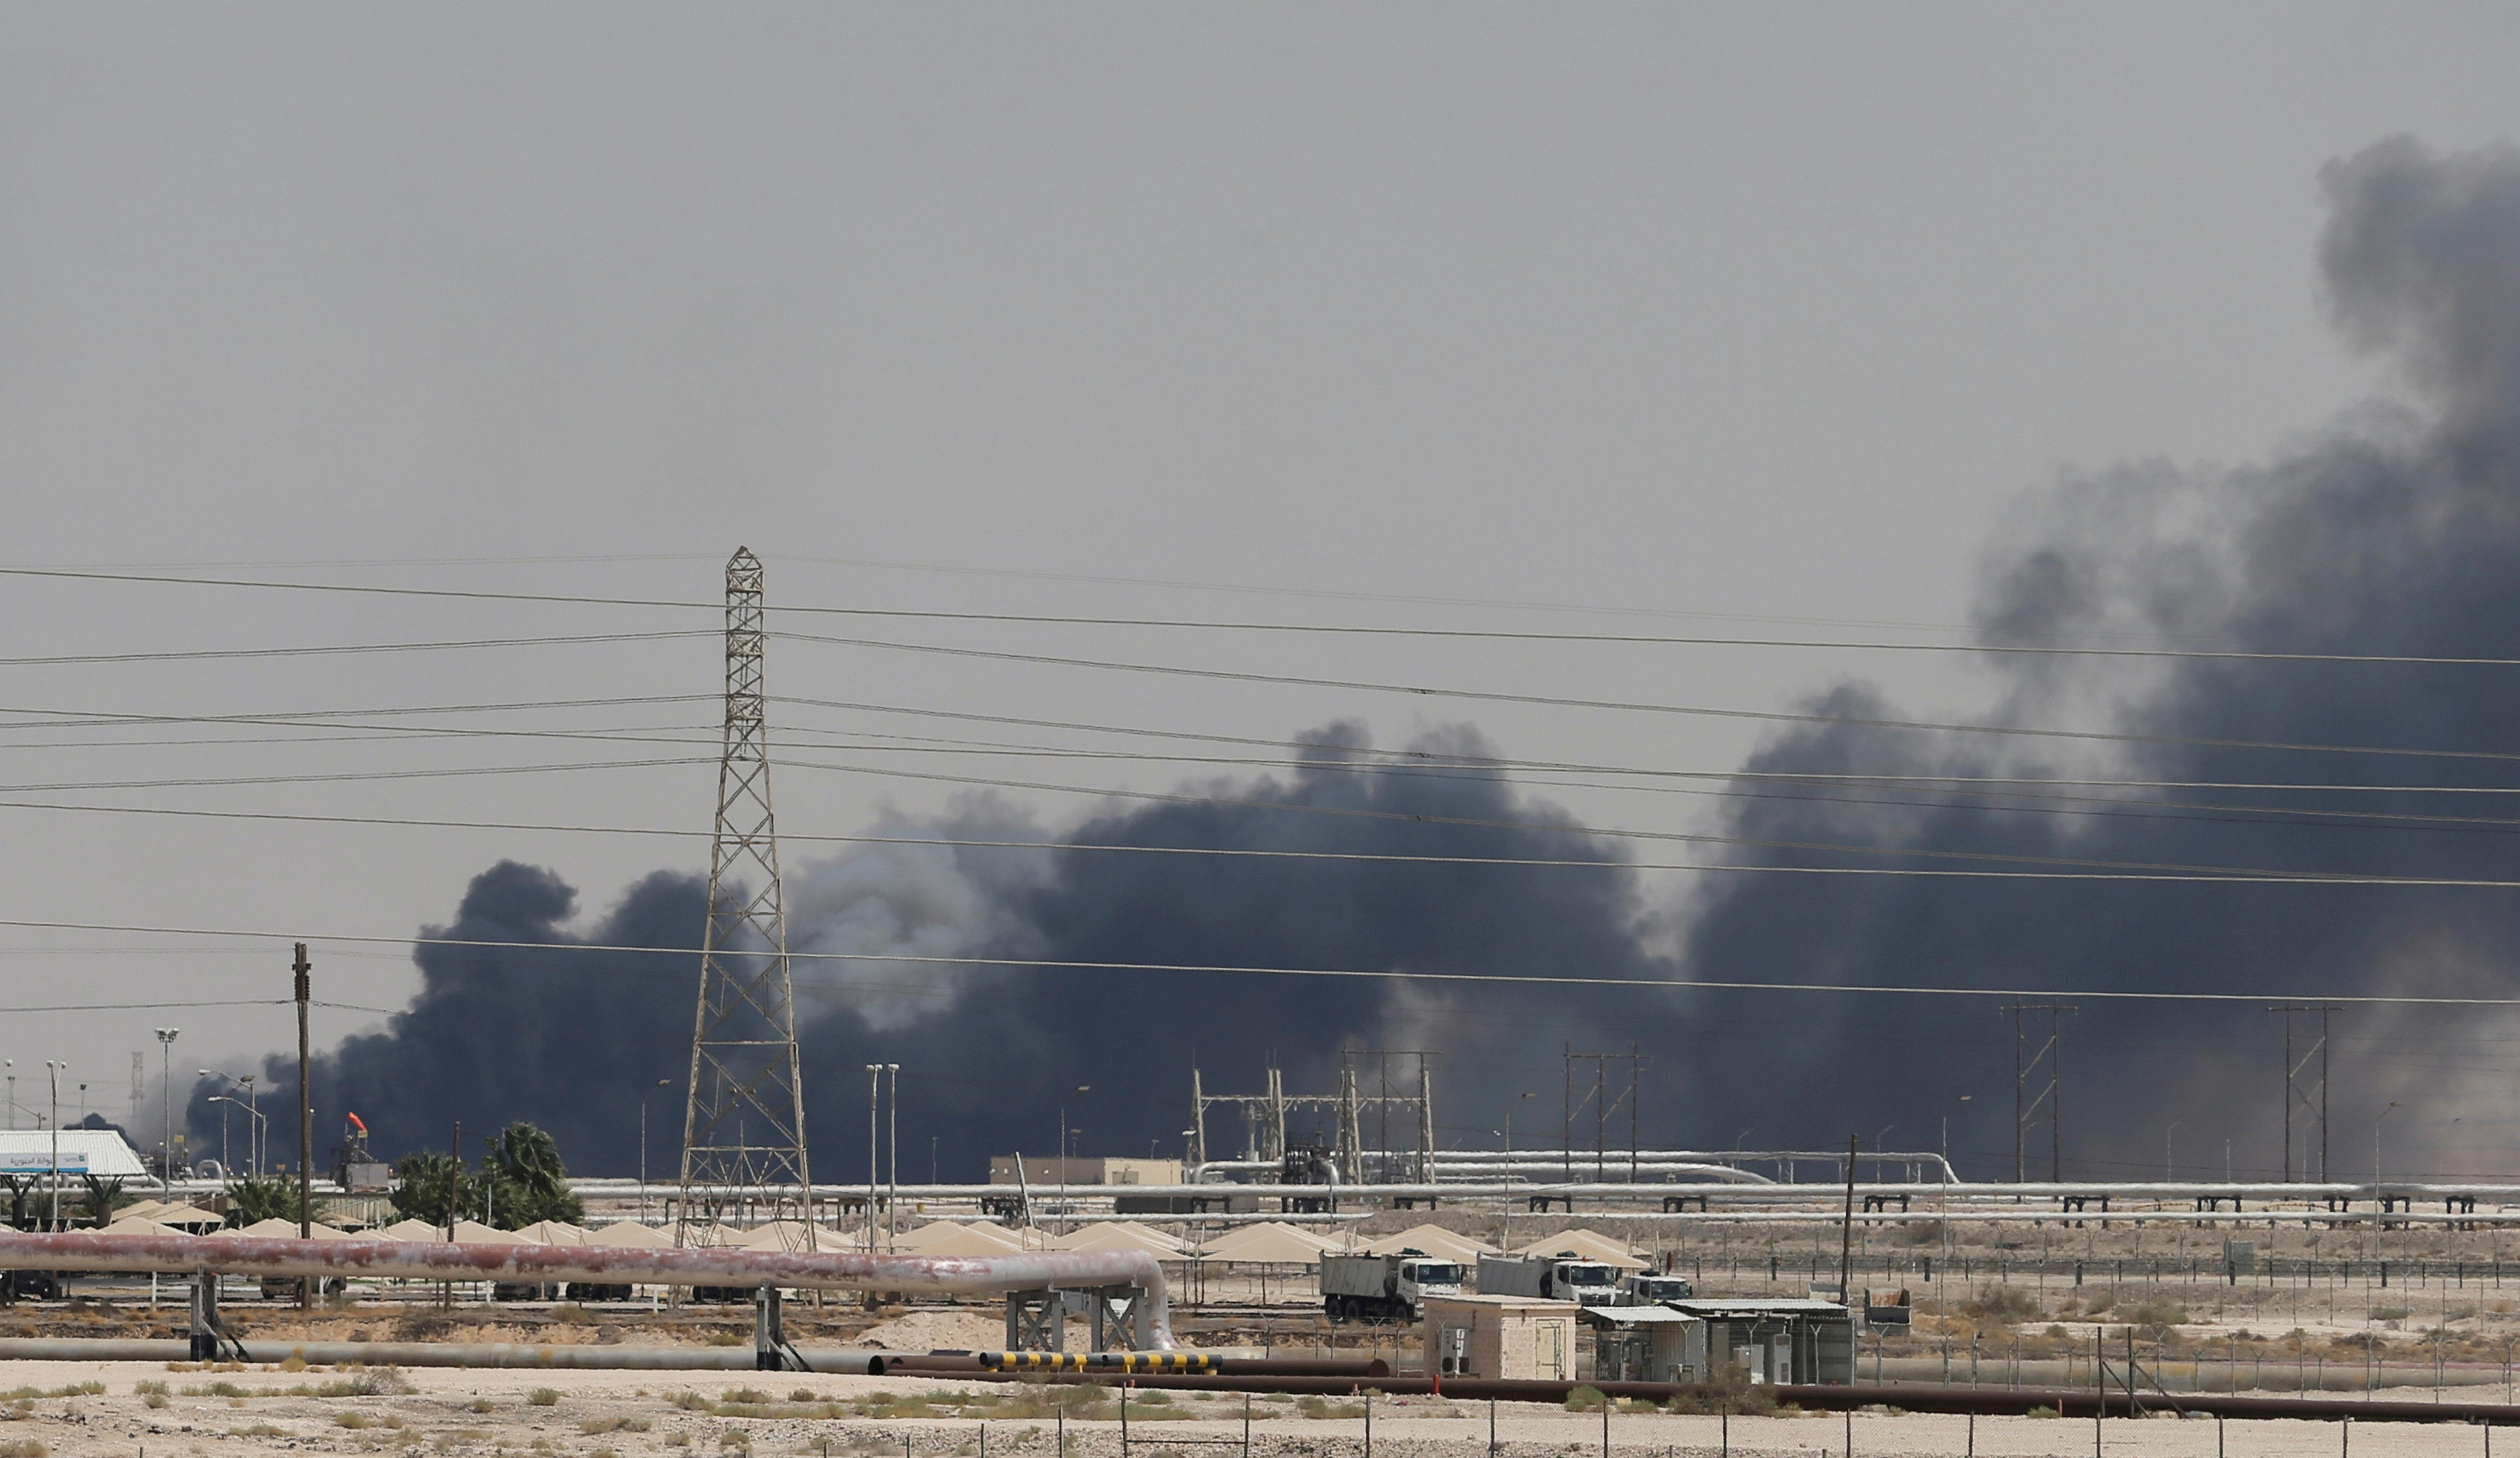 Beleaguered U.S. energy shares soar after attacks on Saudi facilities